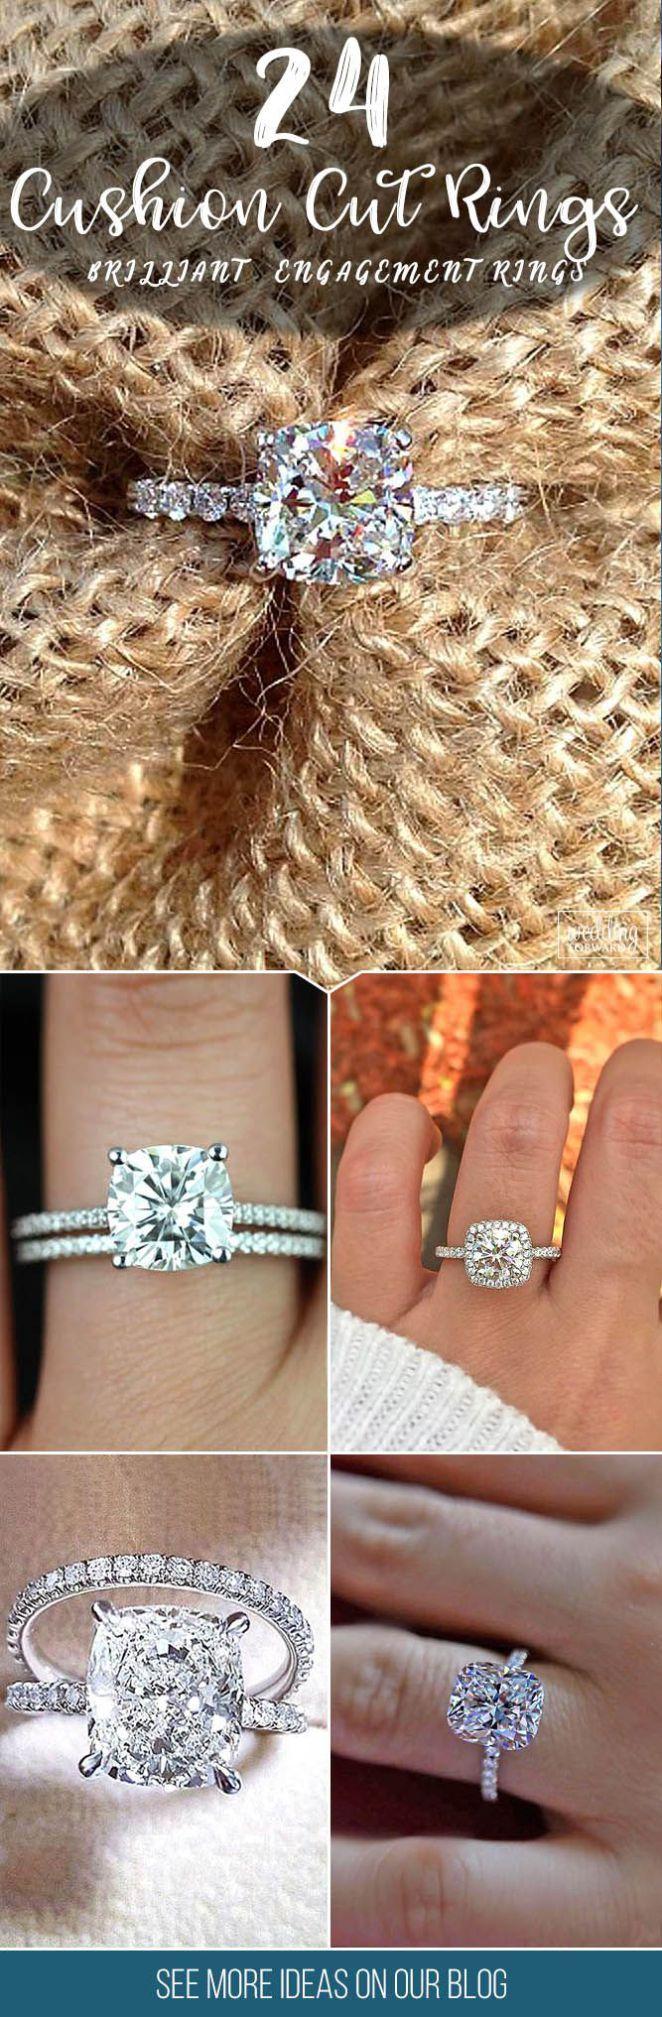 Bague de Fiançailles Tendance 2017/2018 : 24 Brilliant Cushion Cut Engagement Rings Cushion cut engagement rings becom